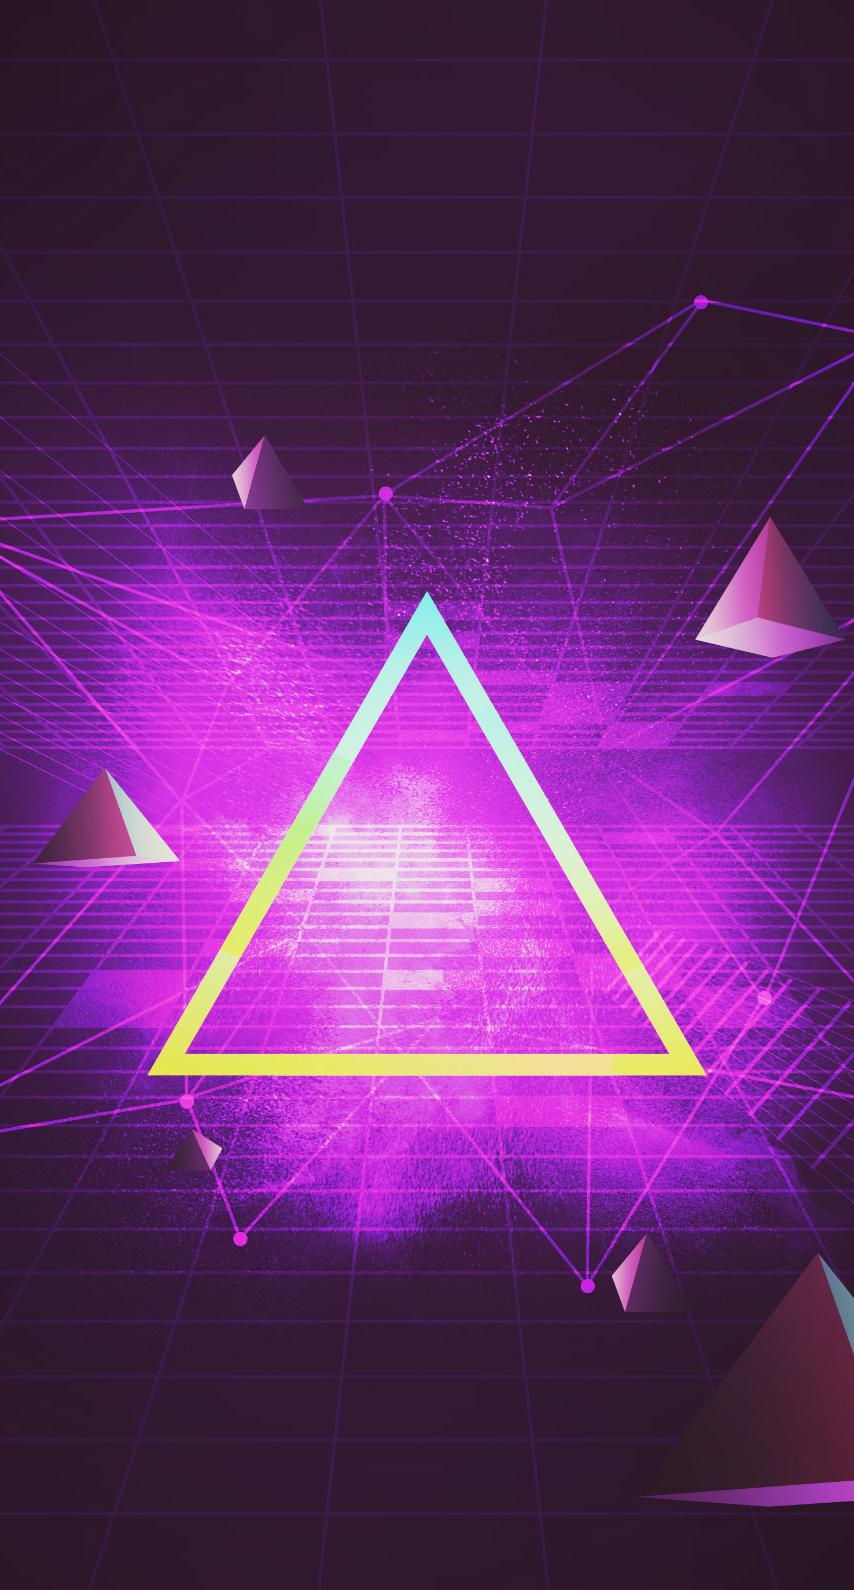 purple, geometric